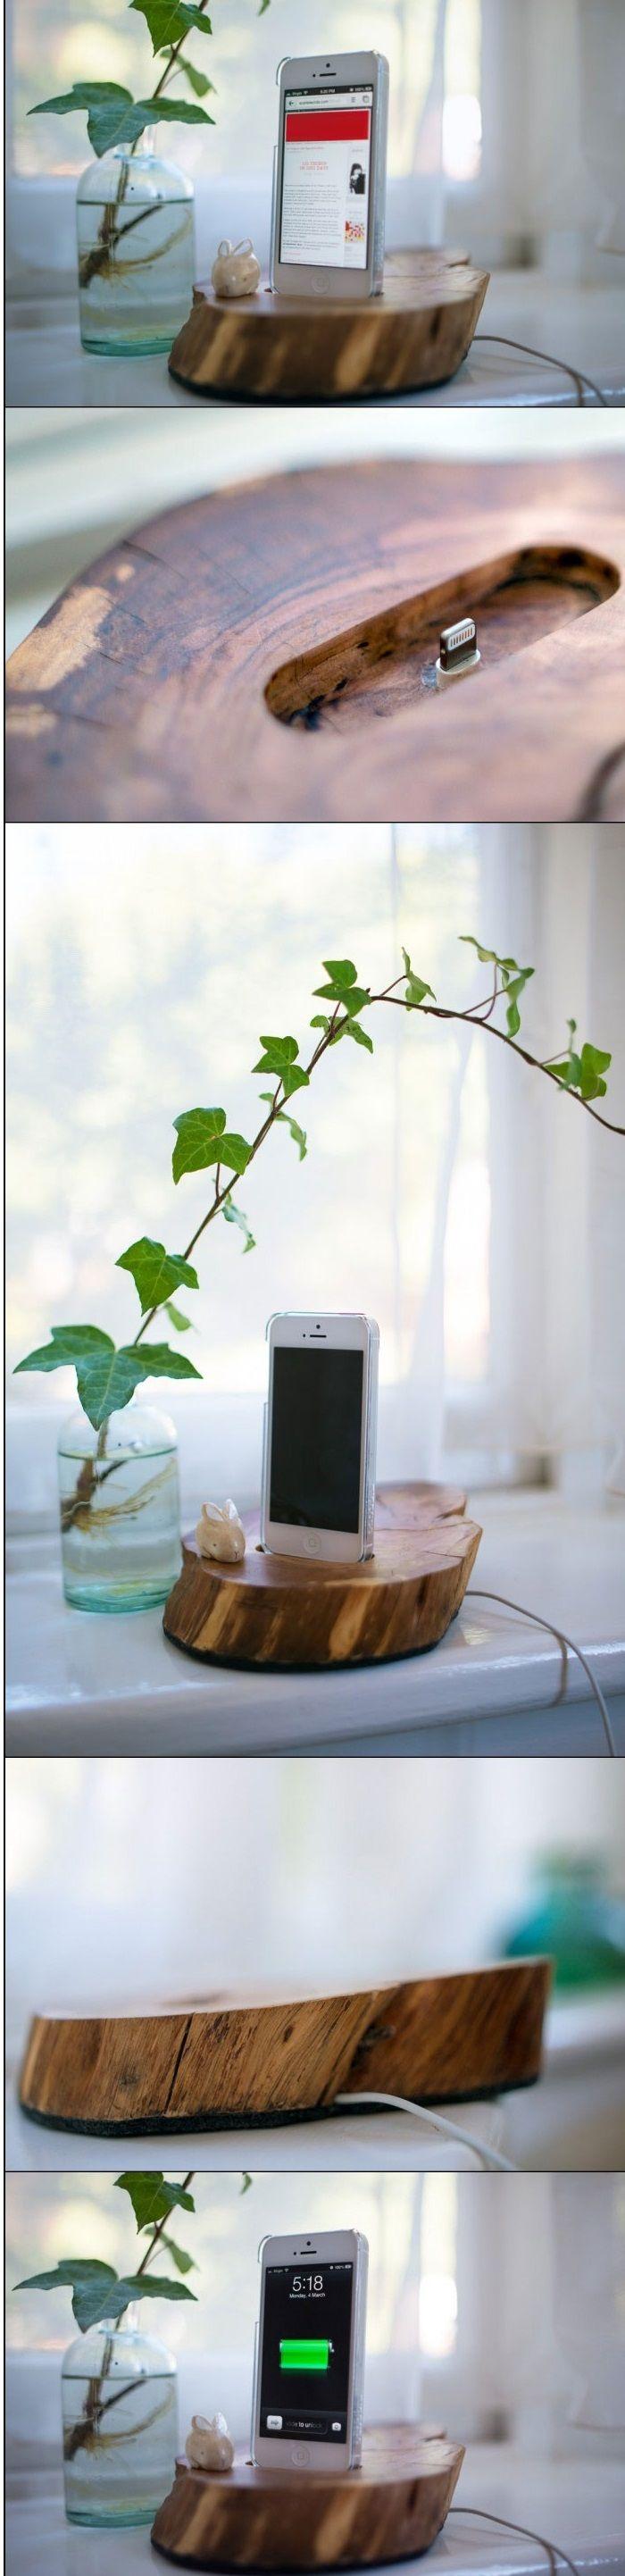 10 ways to make your own wooden work do it at home diy pinterest holz basteln und ideen. Black Bedroom Furniture Sets. Home Design Ideas